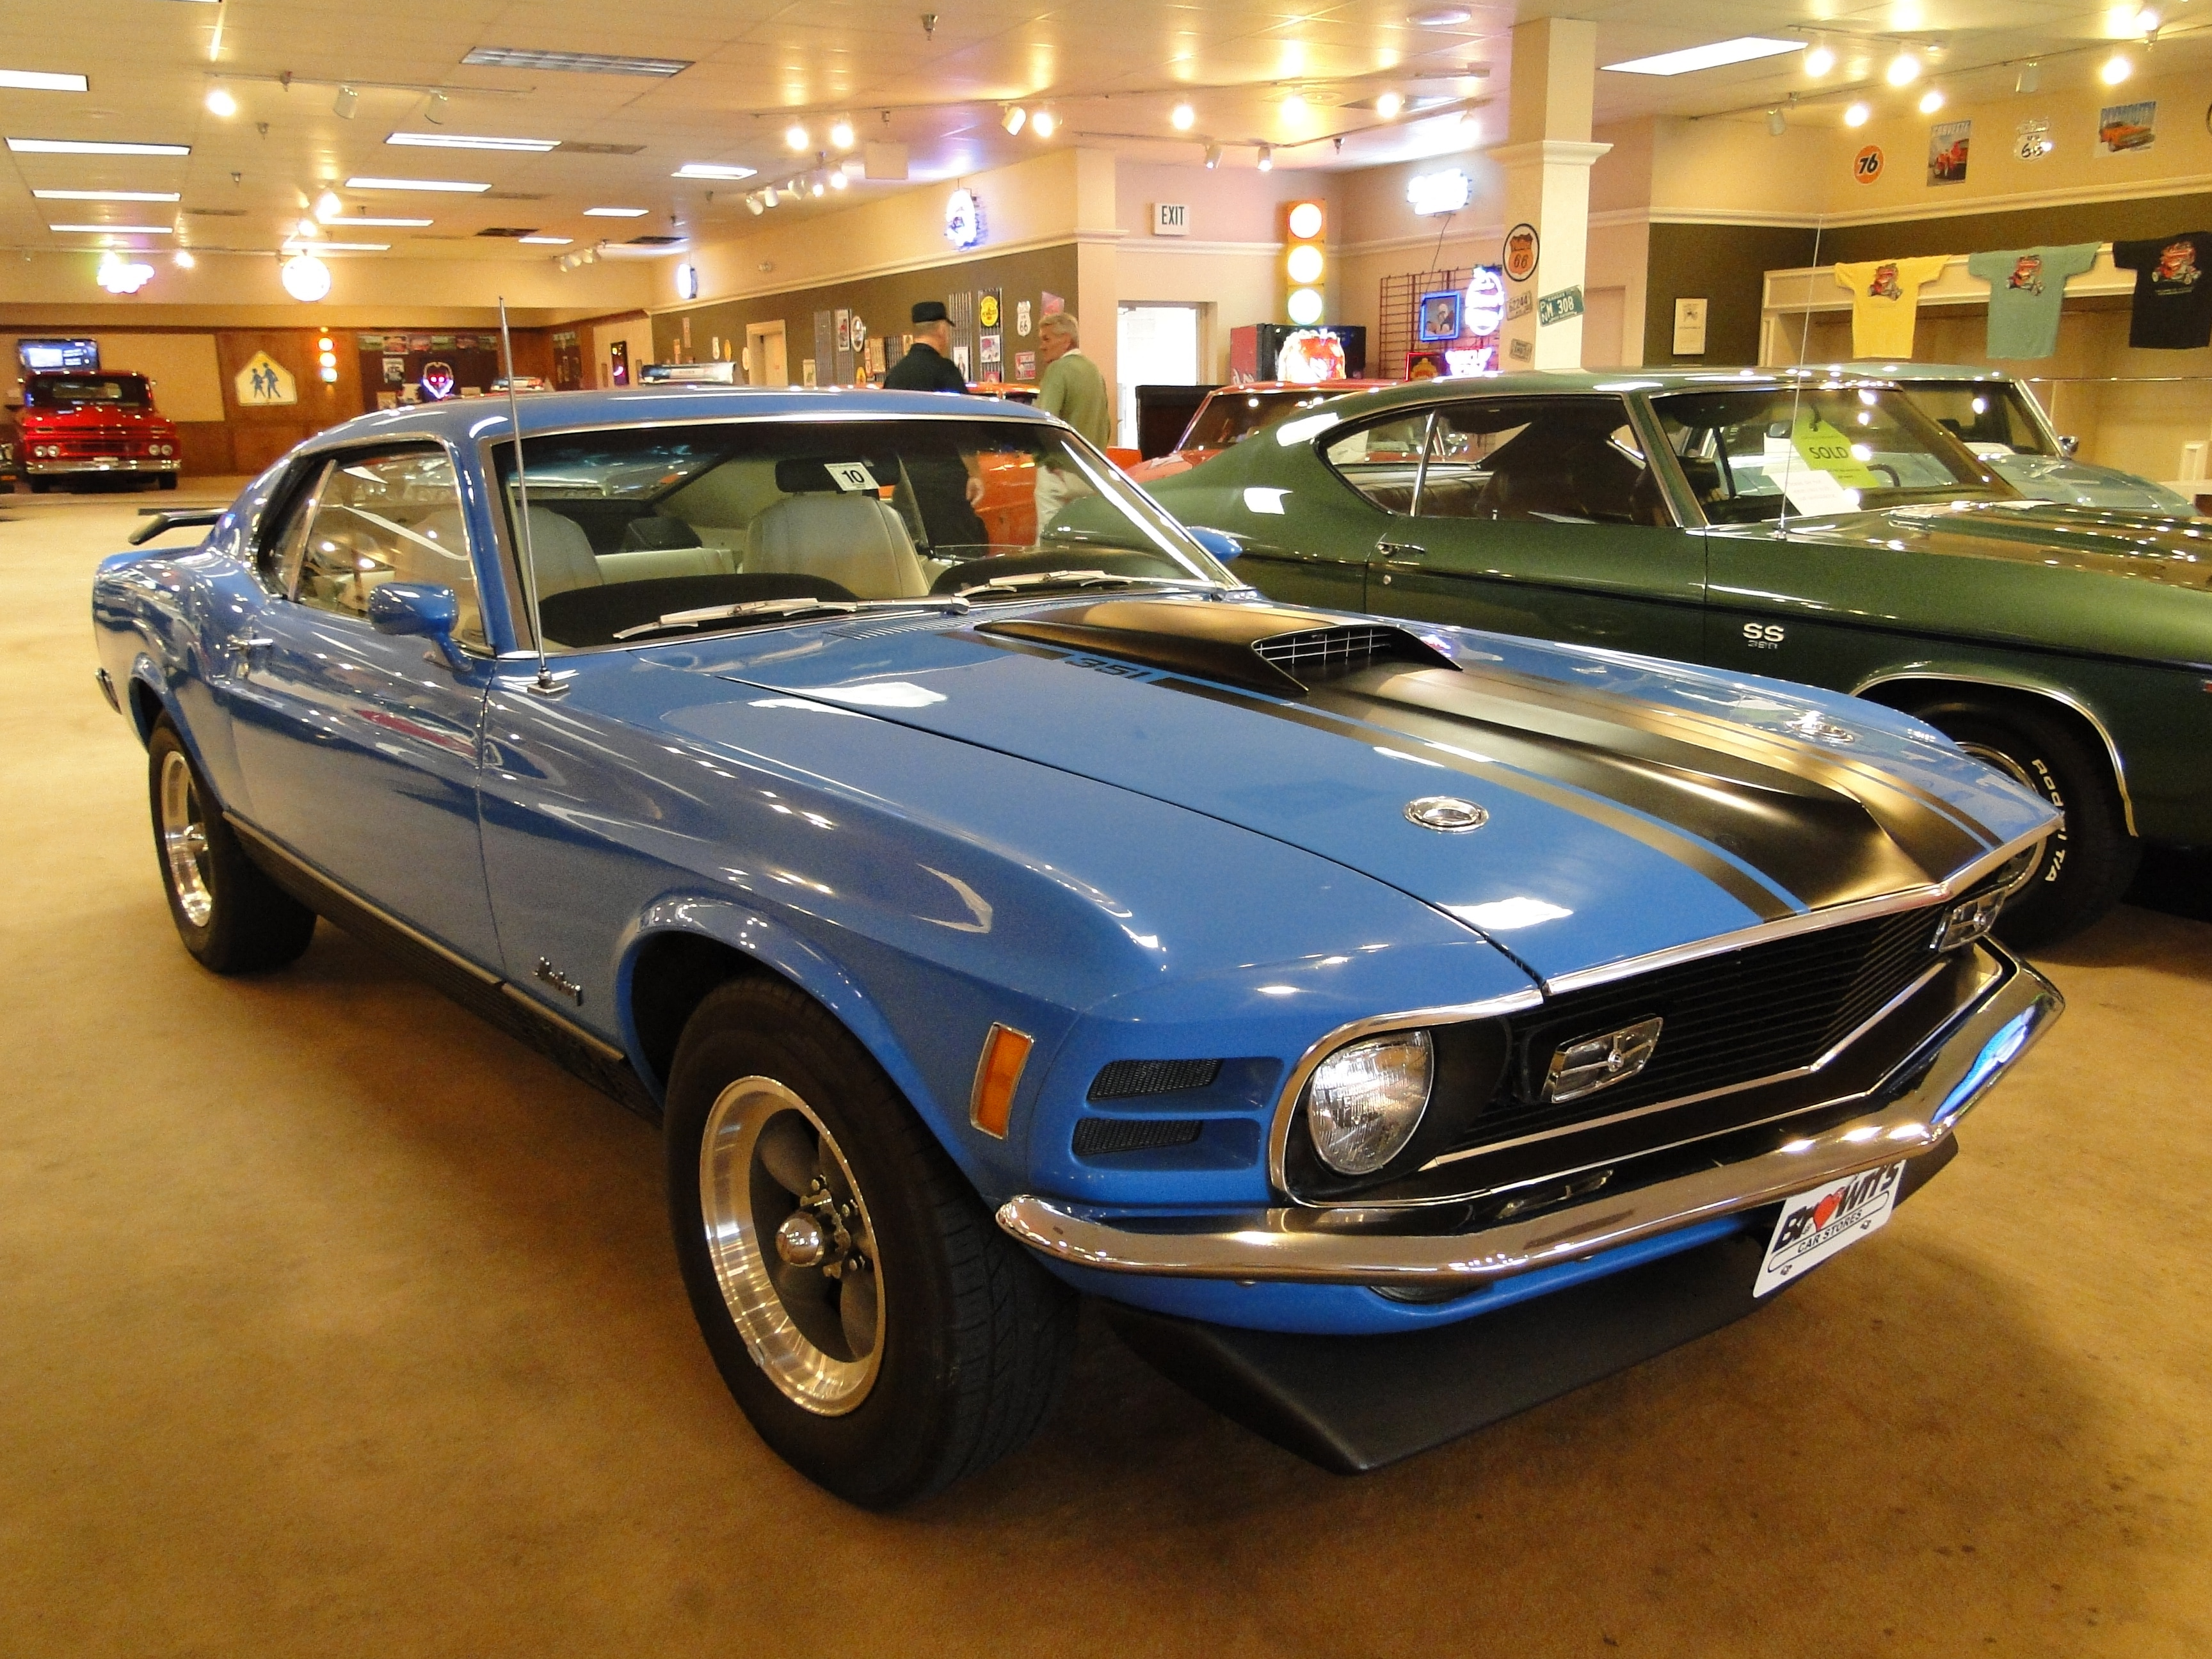 New 1970 Ford Mustang MACH 1 351c 4V  Glen Burnie MD Baltimore